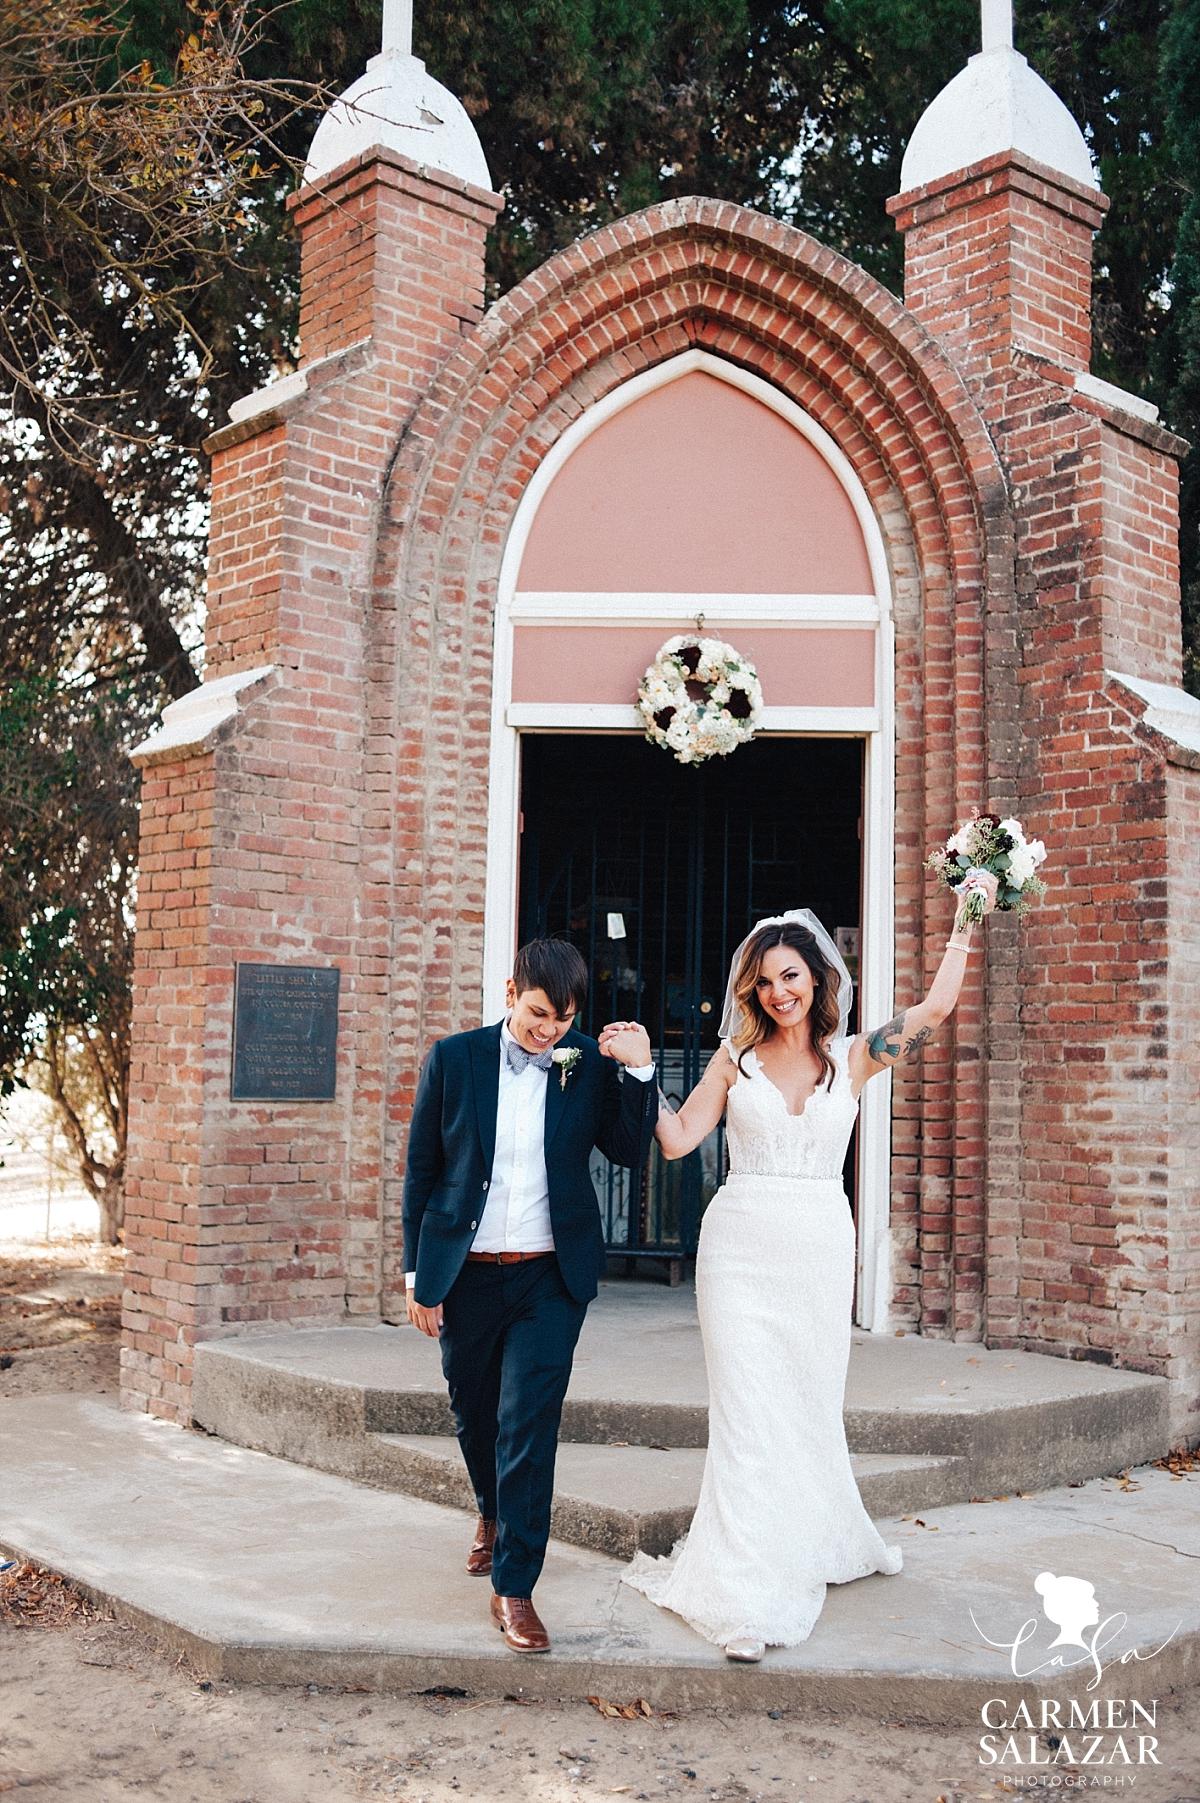 Newlyweds at Coloma Same Sex Wedding - Carmen Salazar